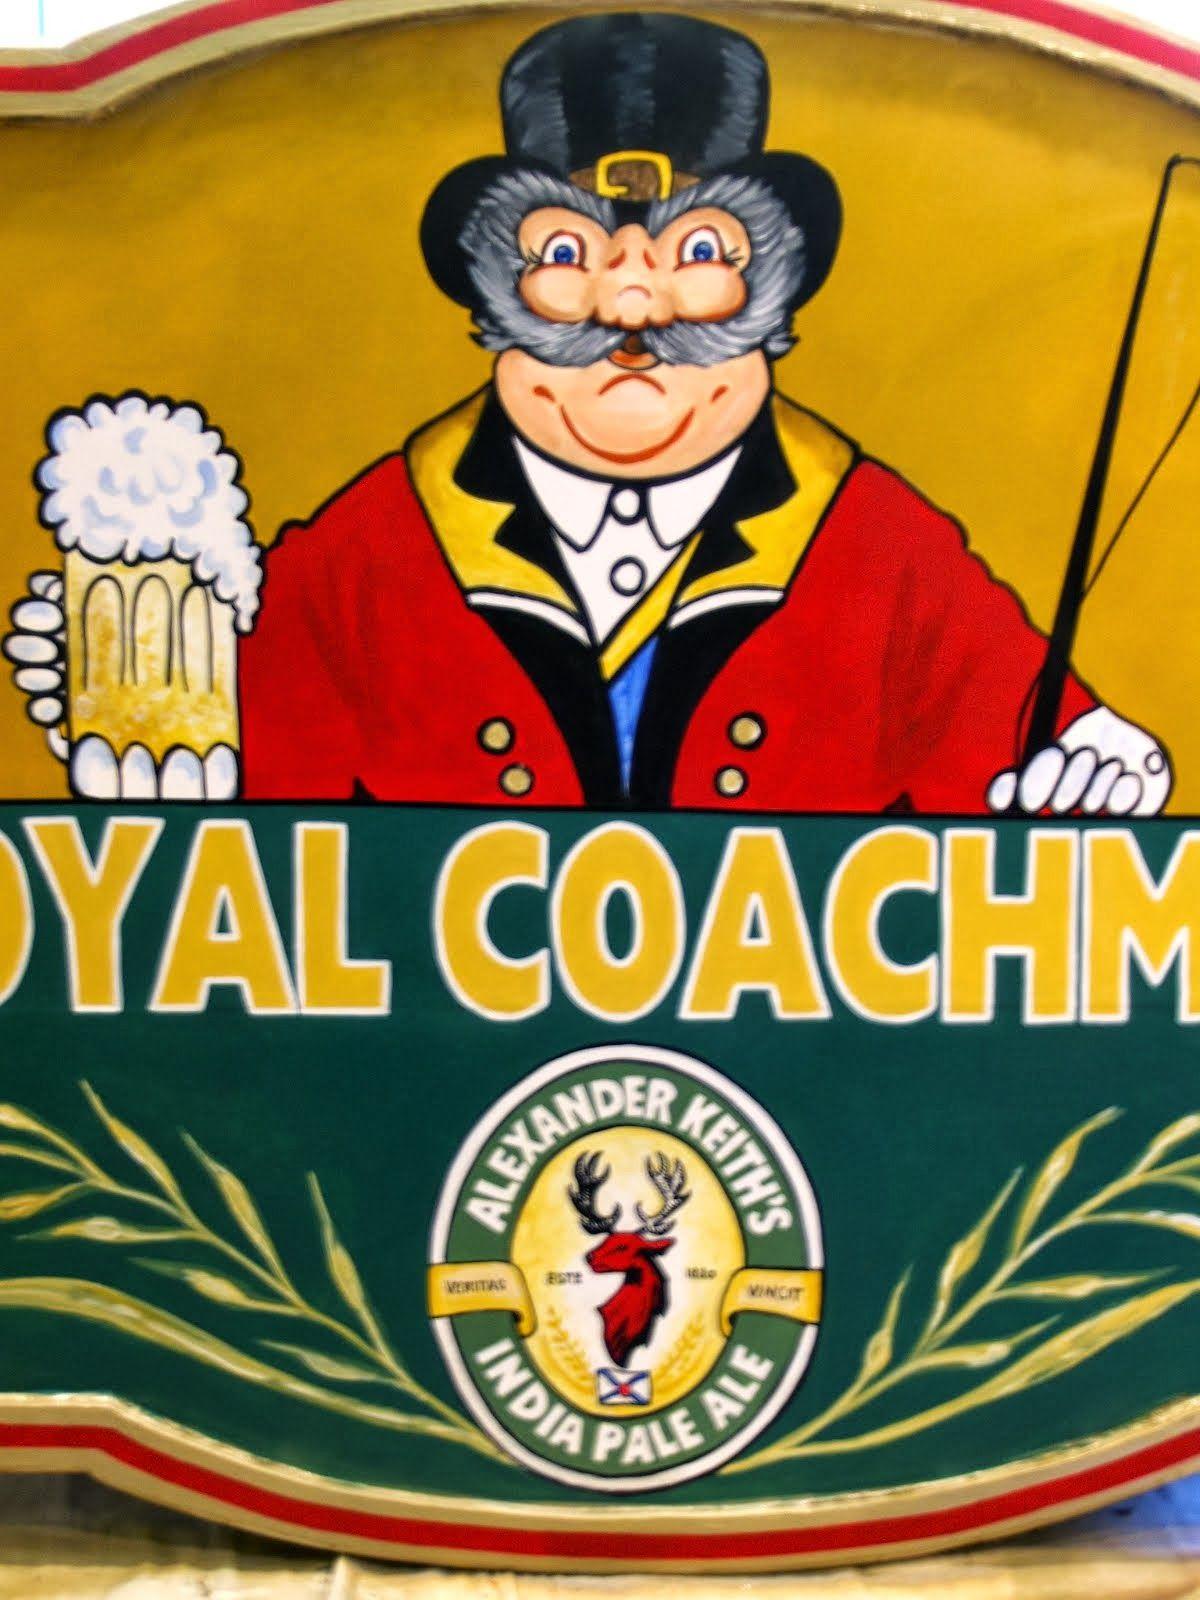 The Royal Coachman Sign ~ Waterdown Ontario